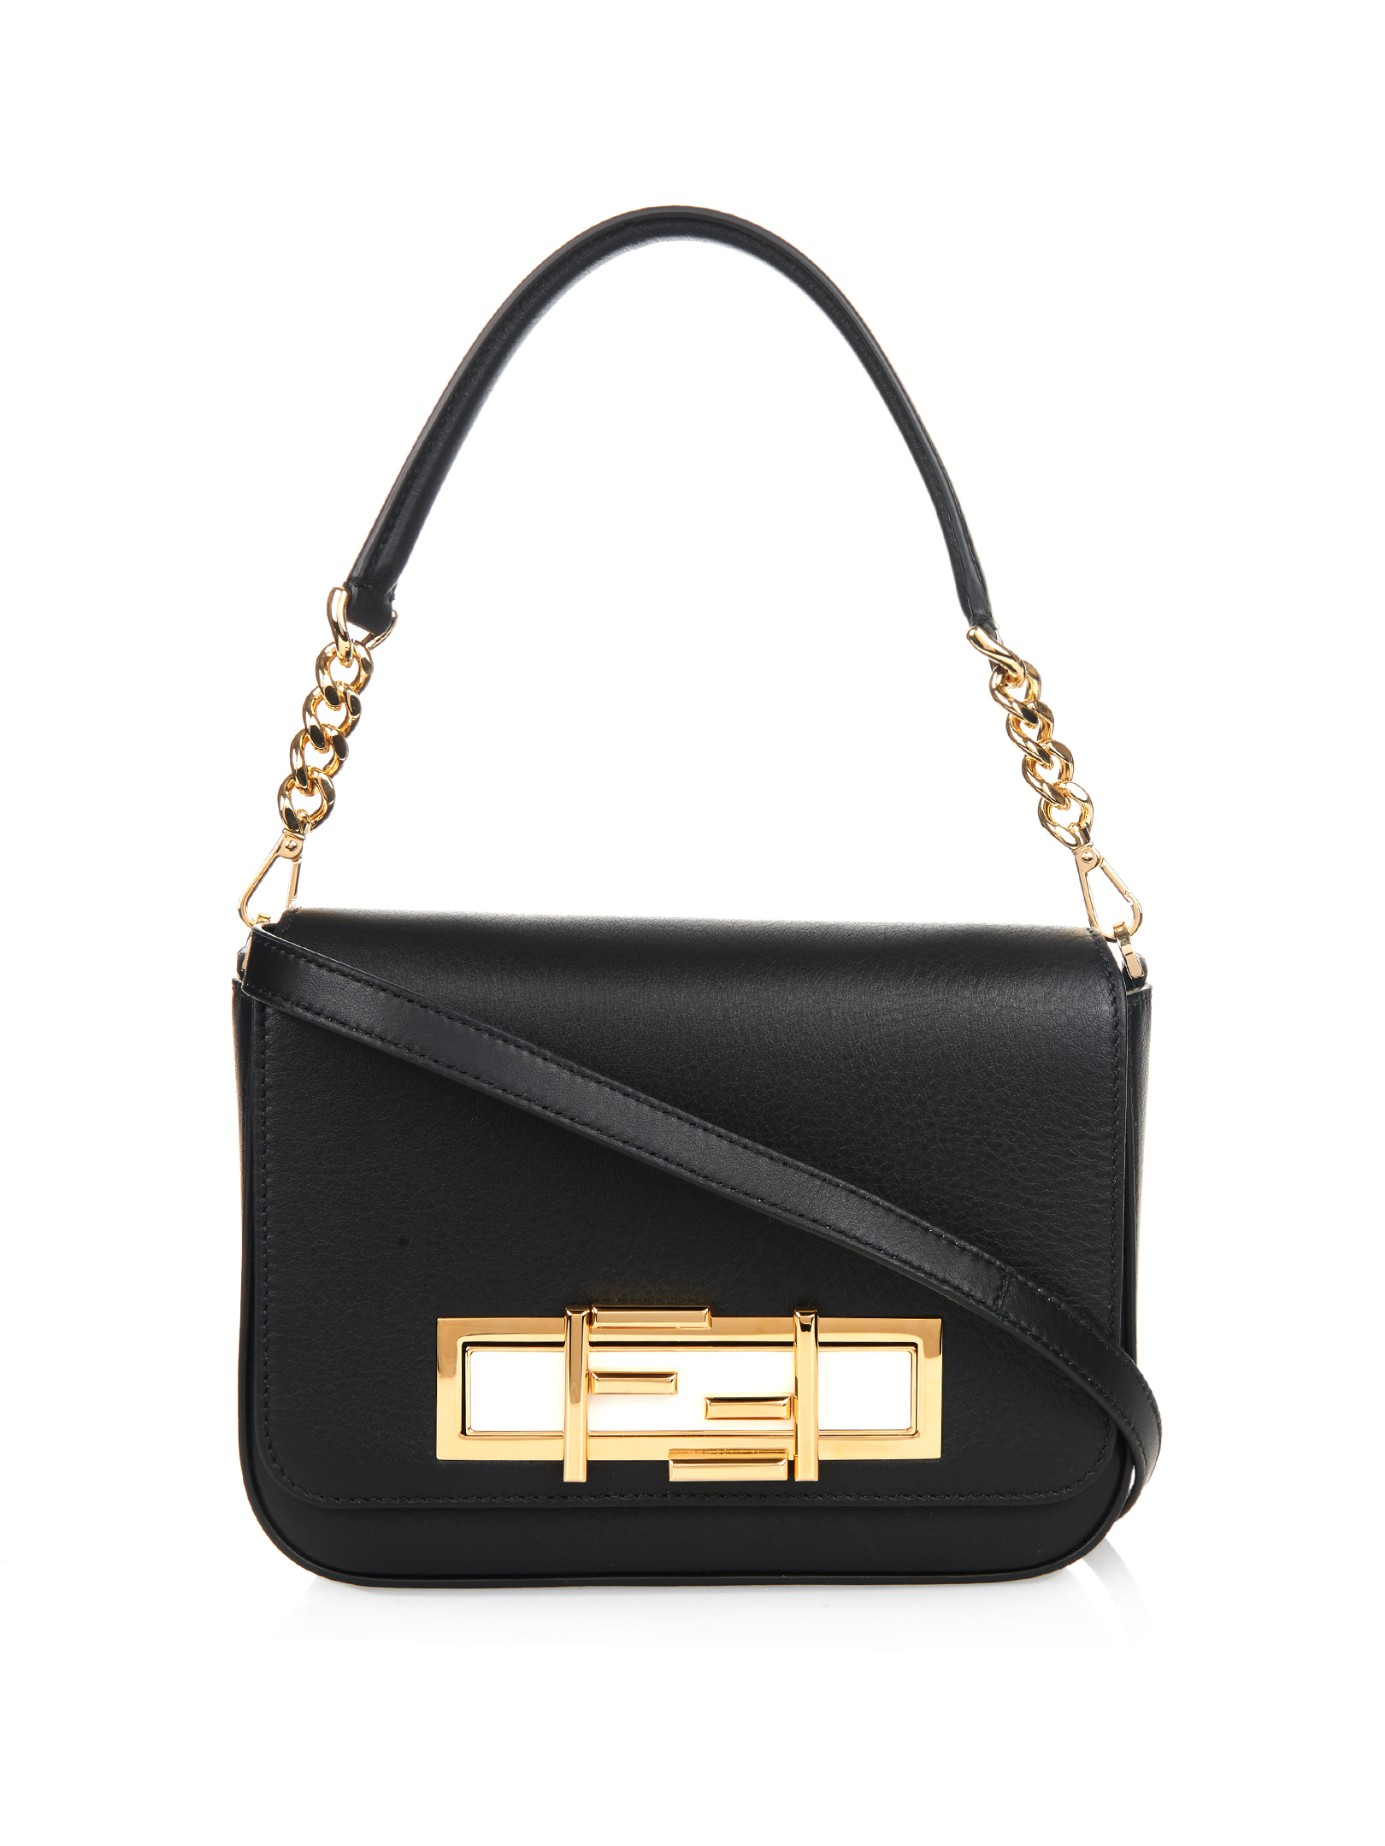 1c93cb4613c6 Lyst - Fendi 3Baguette Leather Cross-Body Bag in Metallic